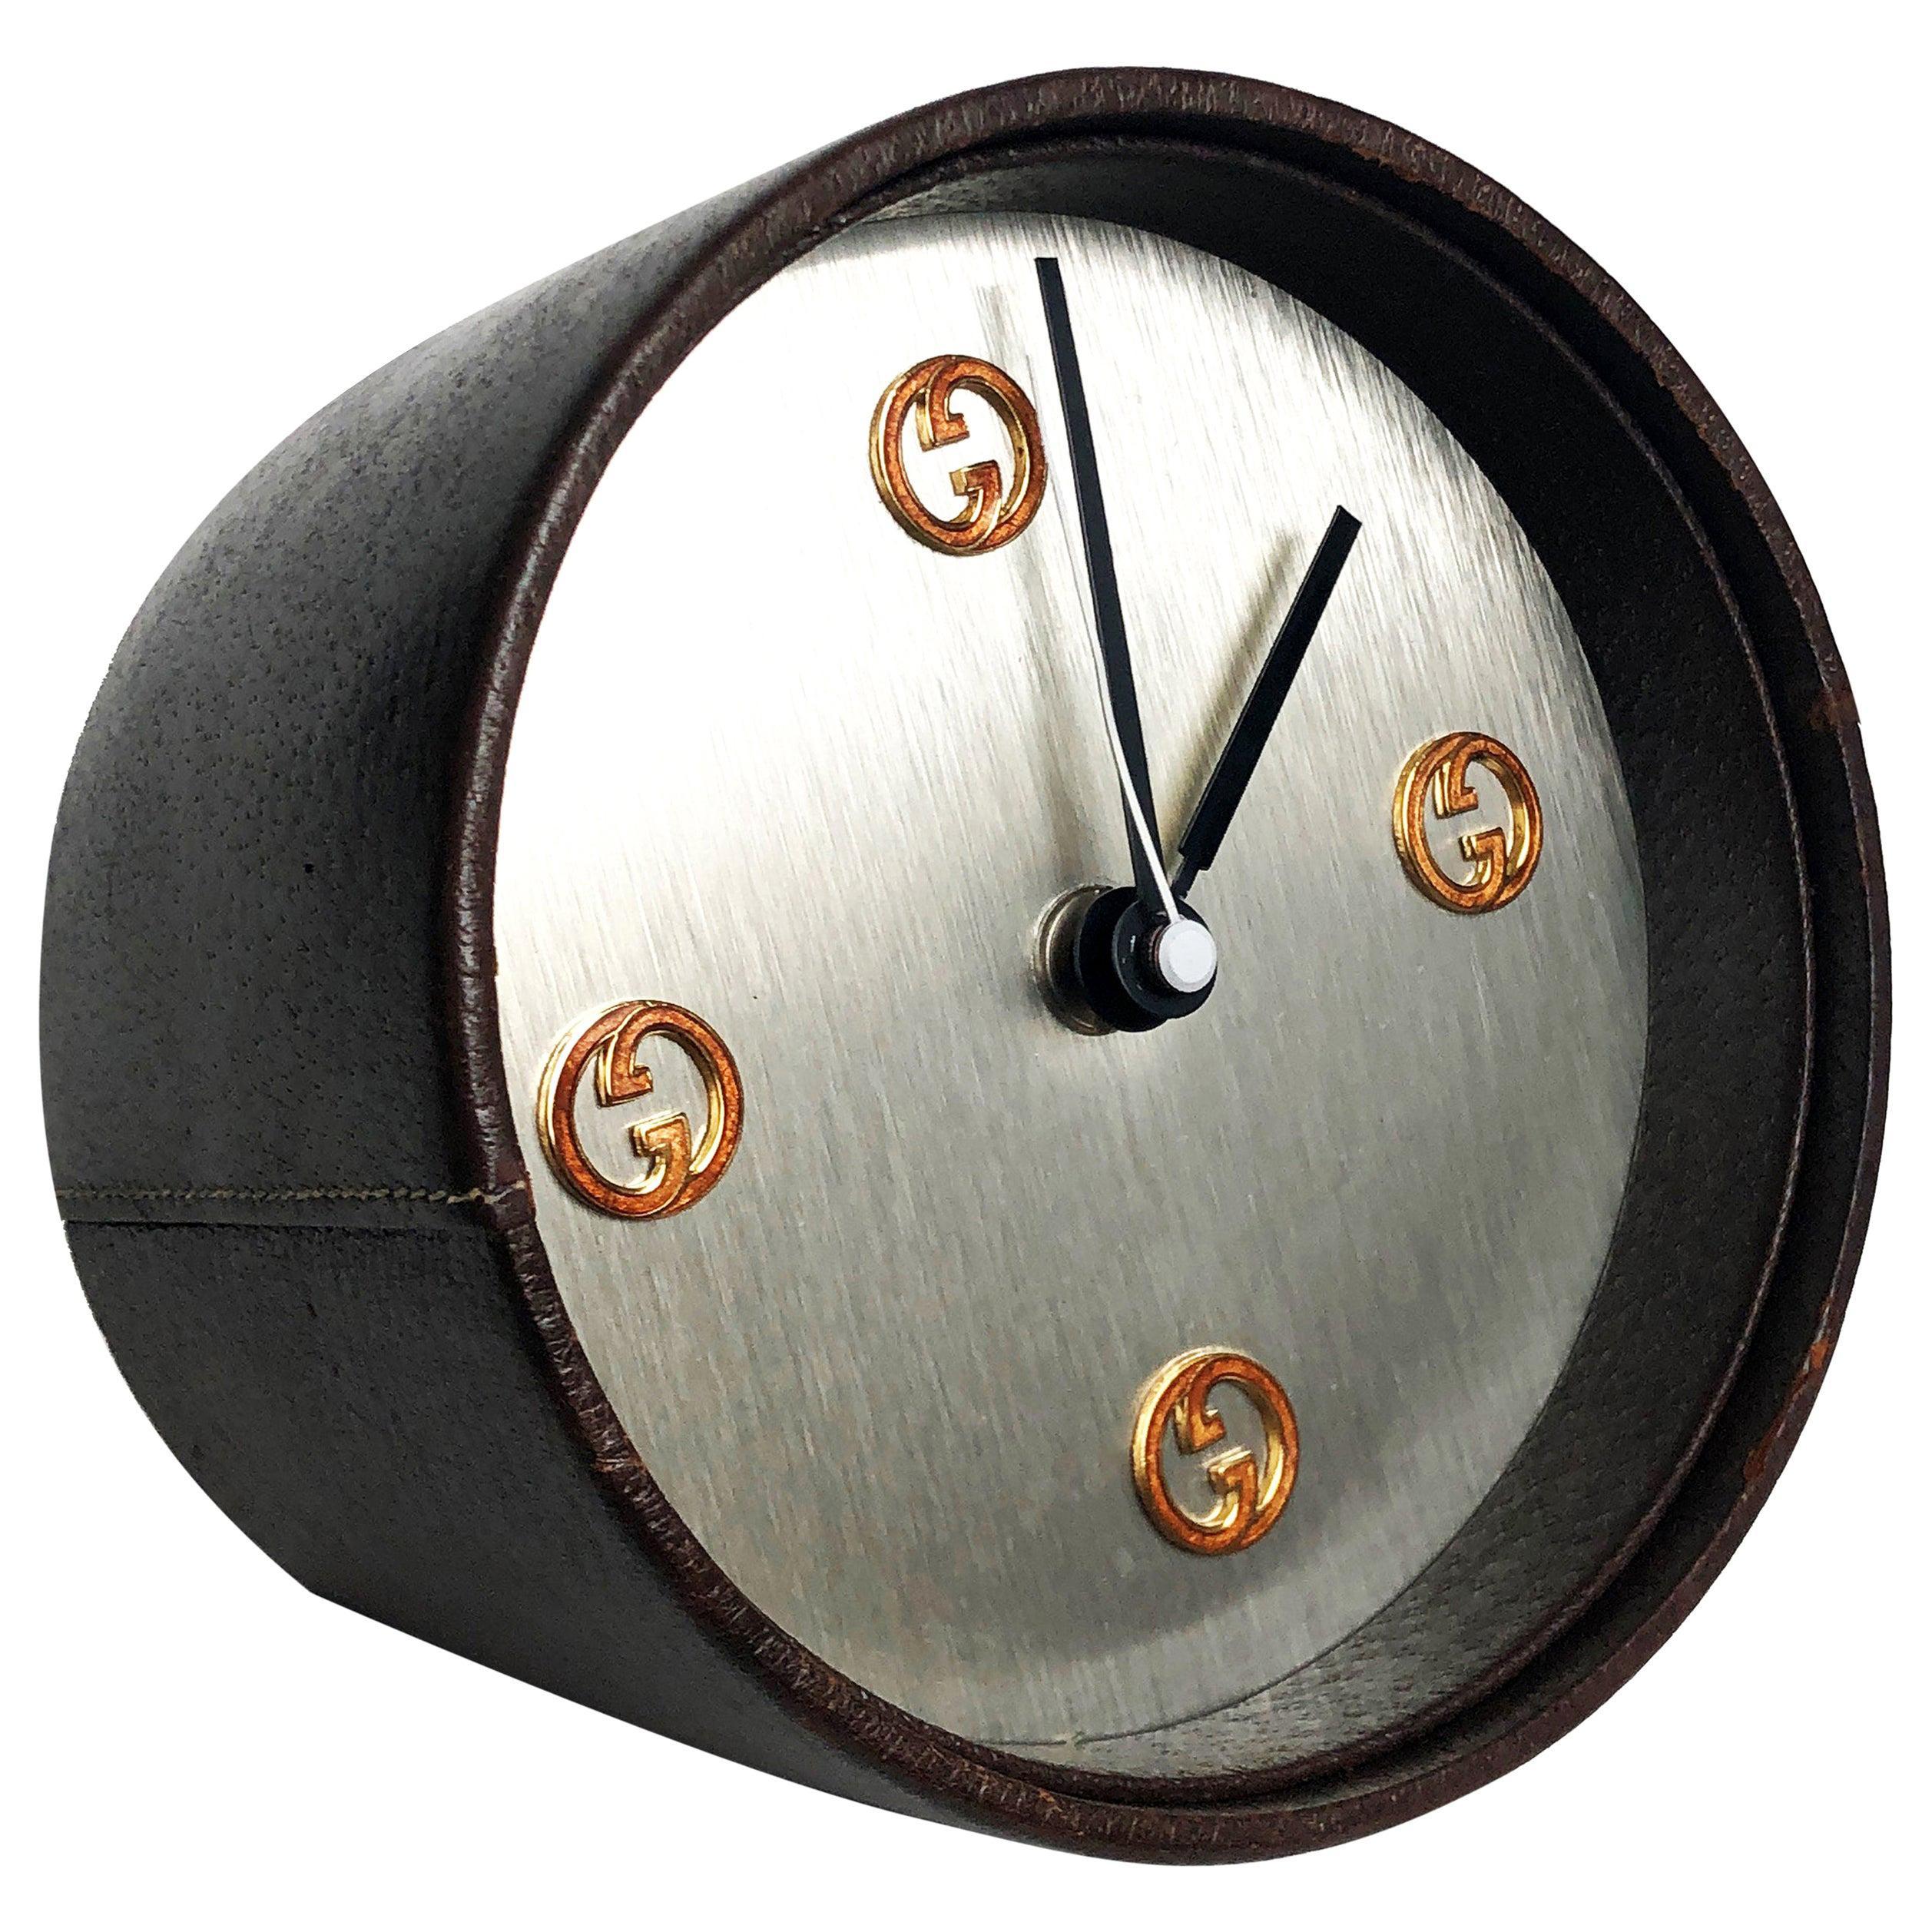 Gucci Desk Clock Pigskin Leather Vintage 80s Home Decor Interior Design